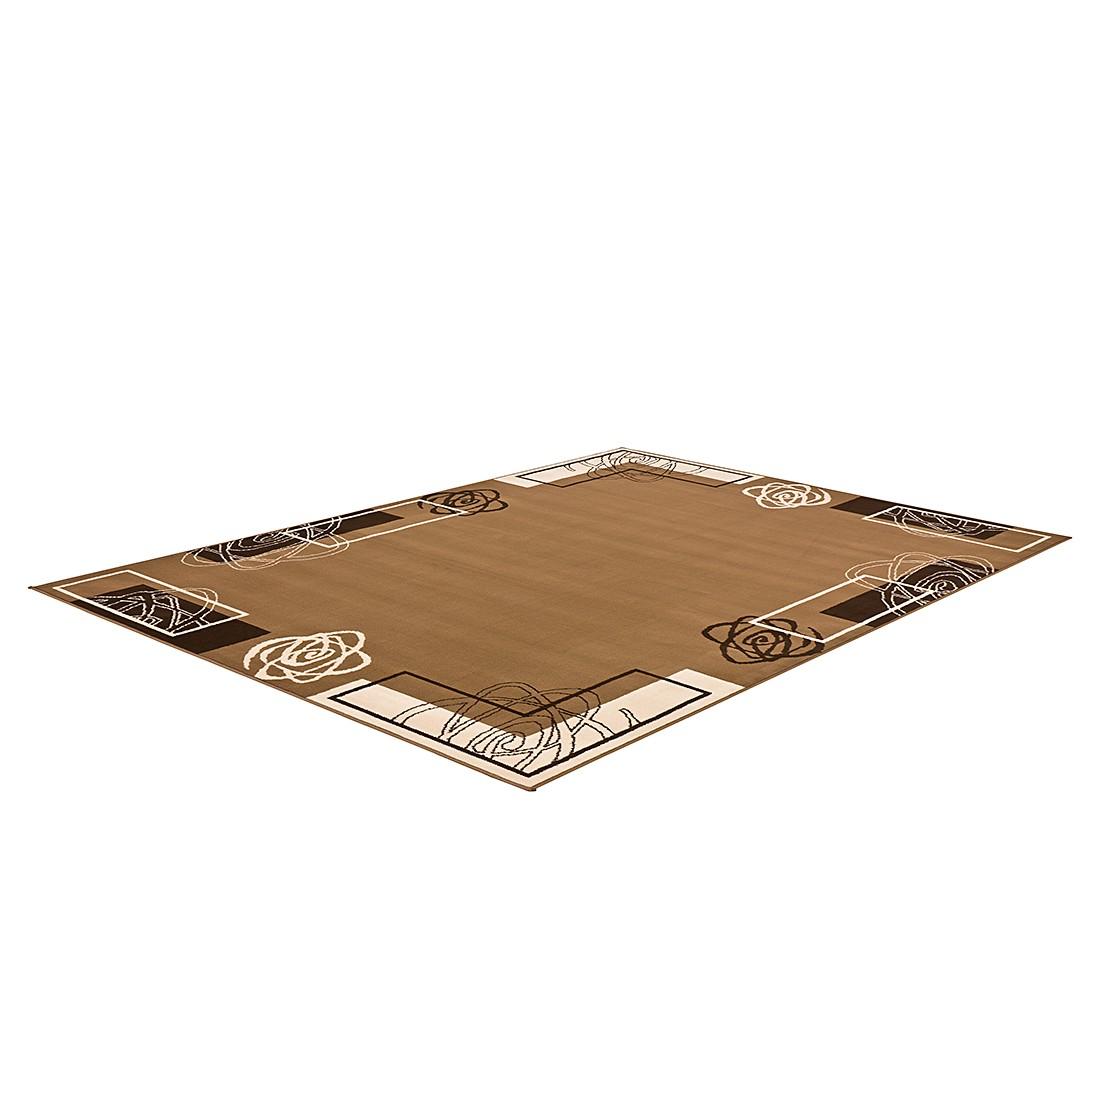 Tapijt Prime Pile Scribble - Beige - 160x230CM, Hanse Home Collection